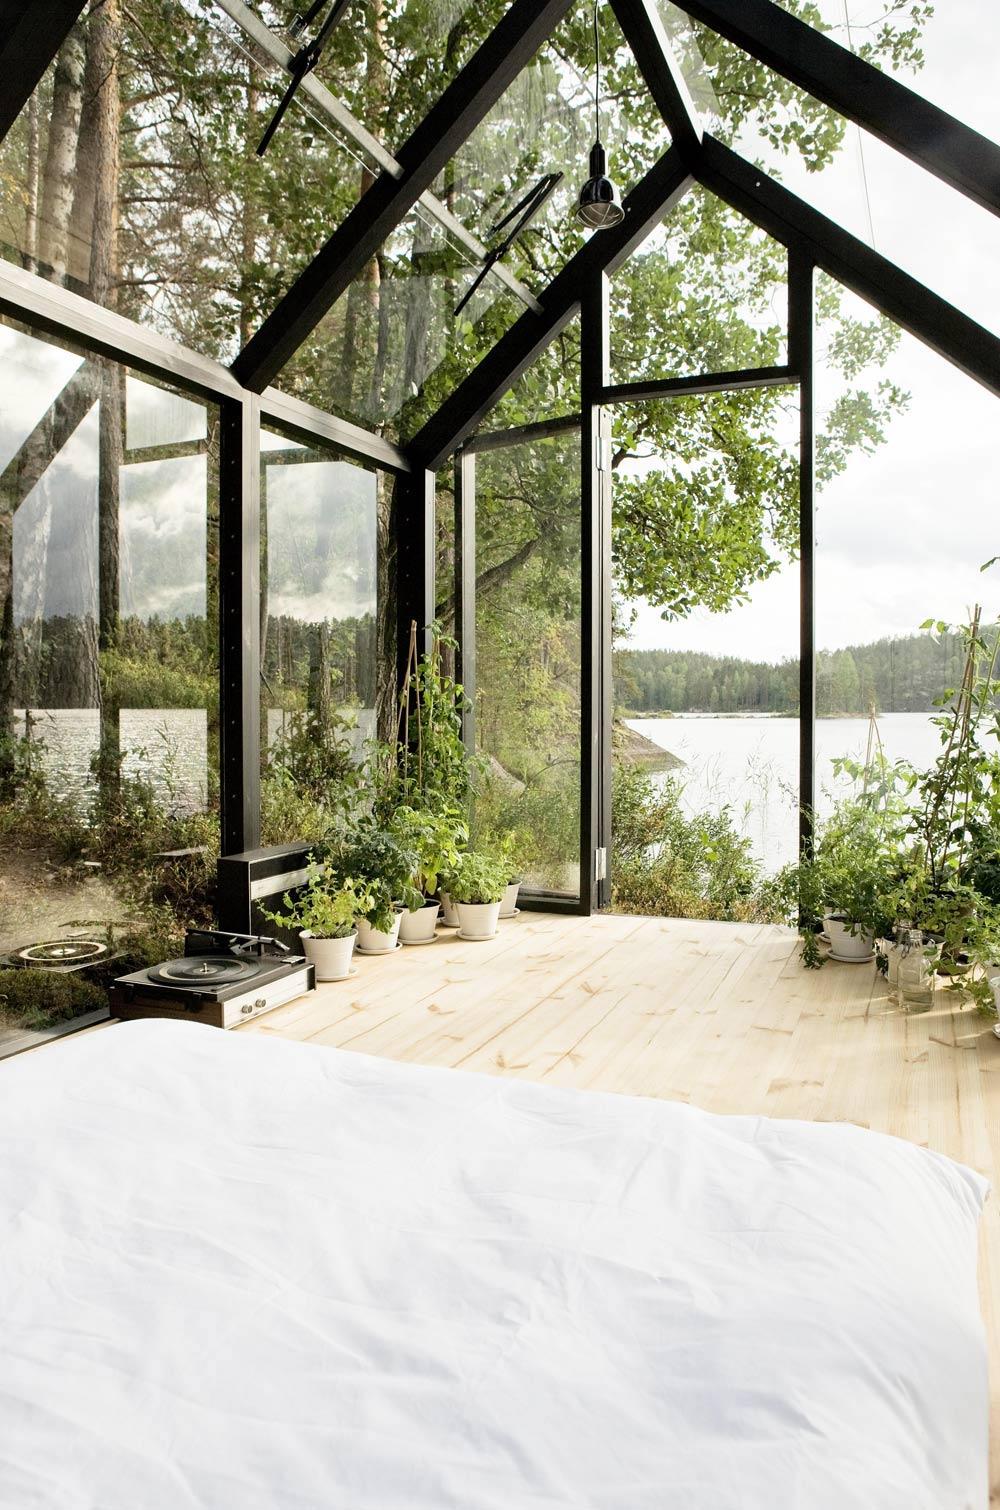 Oracle, Fox, Sunday, Sanctuary, White, Interior, White, Greenhouse, Bedroom